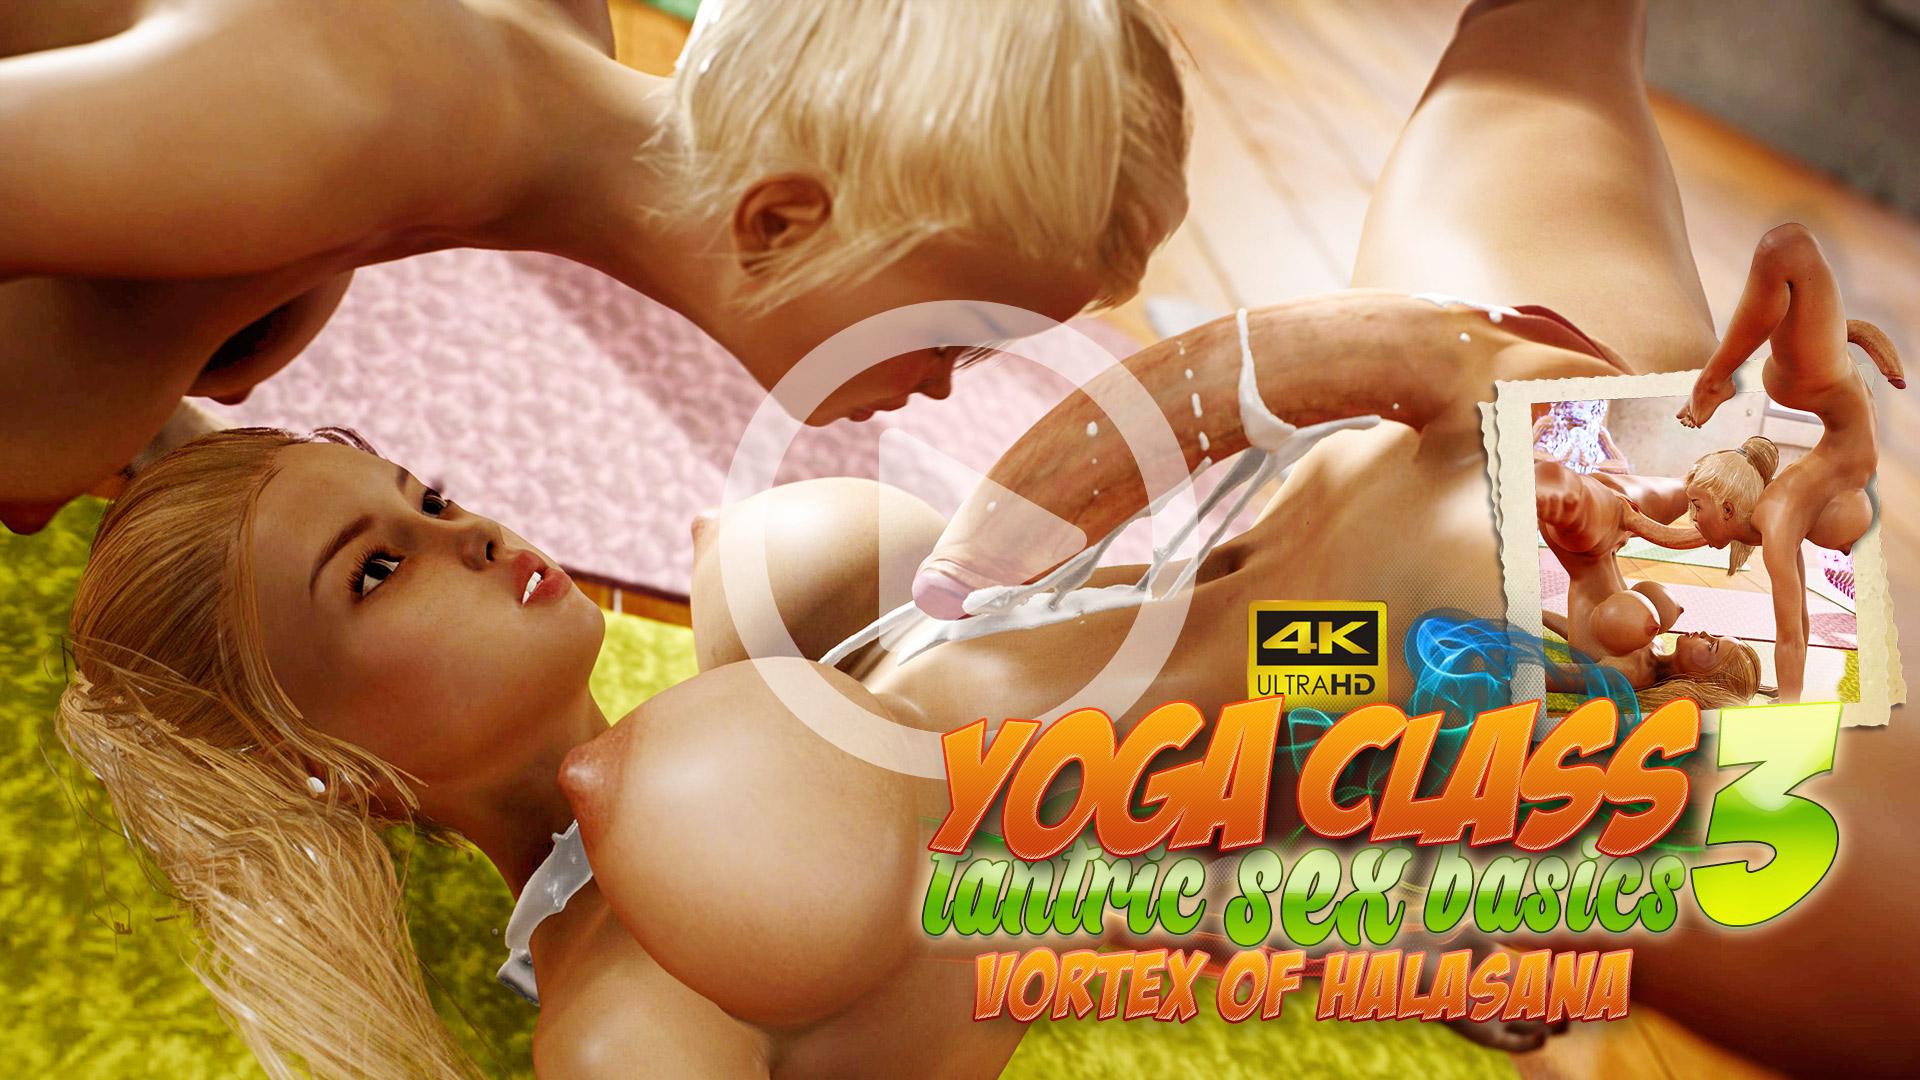 Yoga Class - Tantric Sex Basics 3. Vortex Of Halasana 3DX video trailer